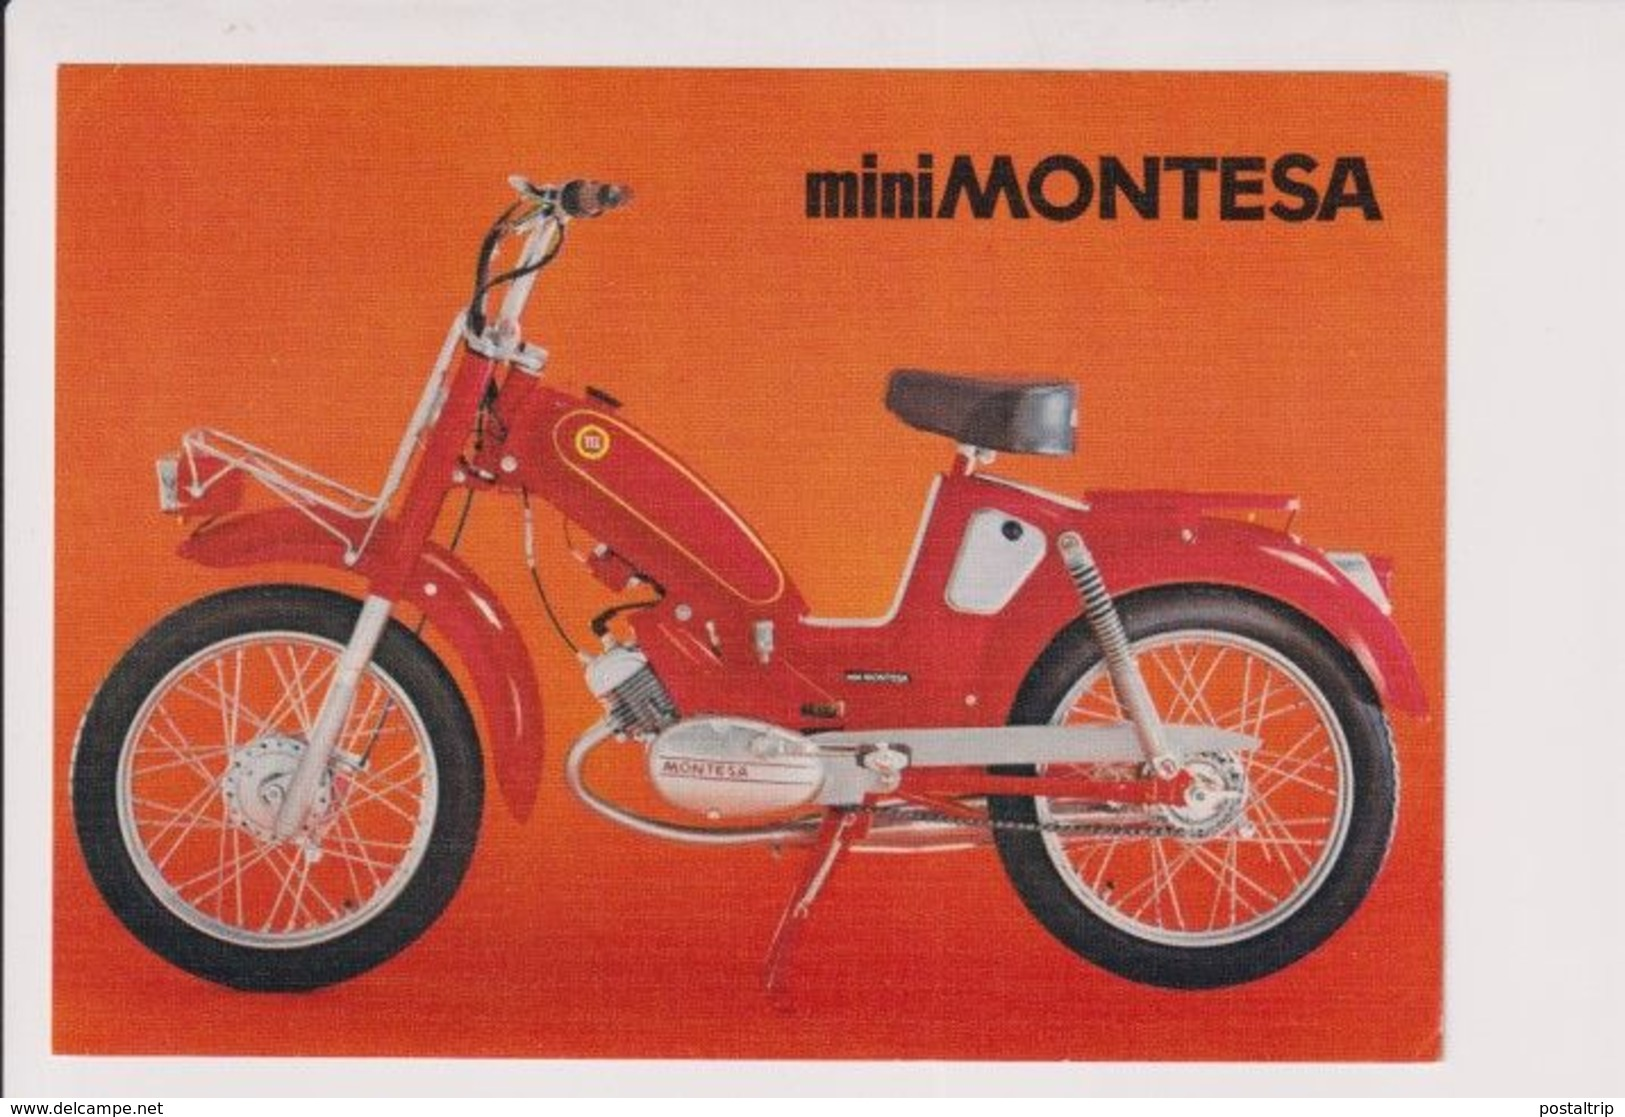 MINI MONTESA +-11x15,5cm Moto MOTOCROSS MOTORCYCLE Douglas J Jackson Archive Of Motorcycles - Other